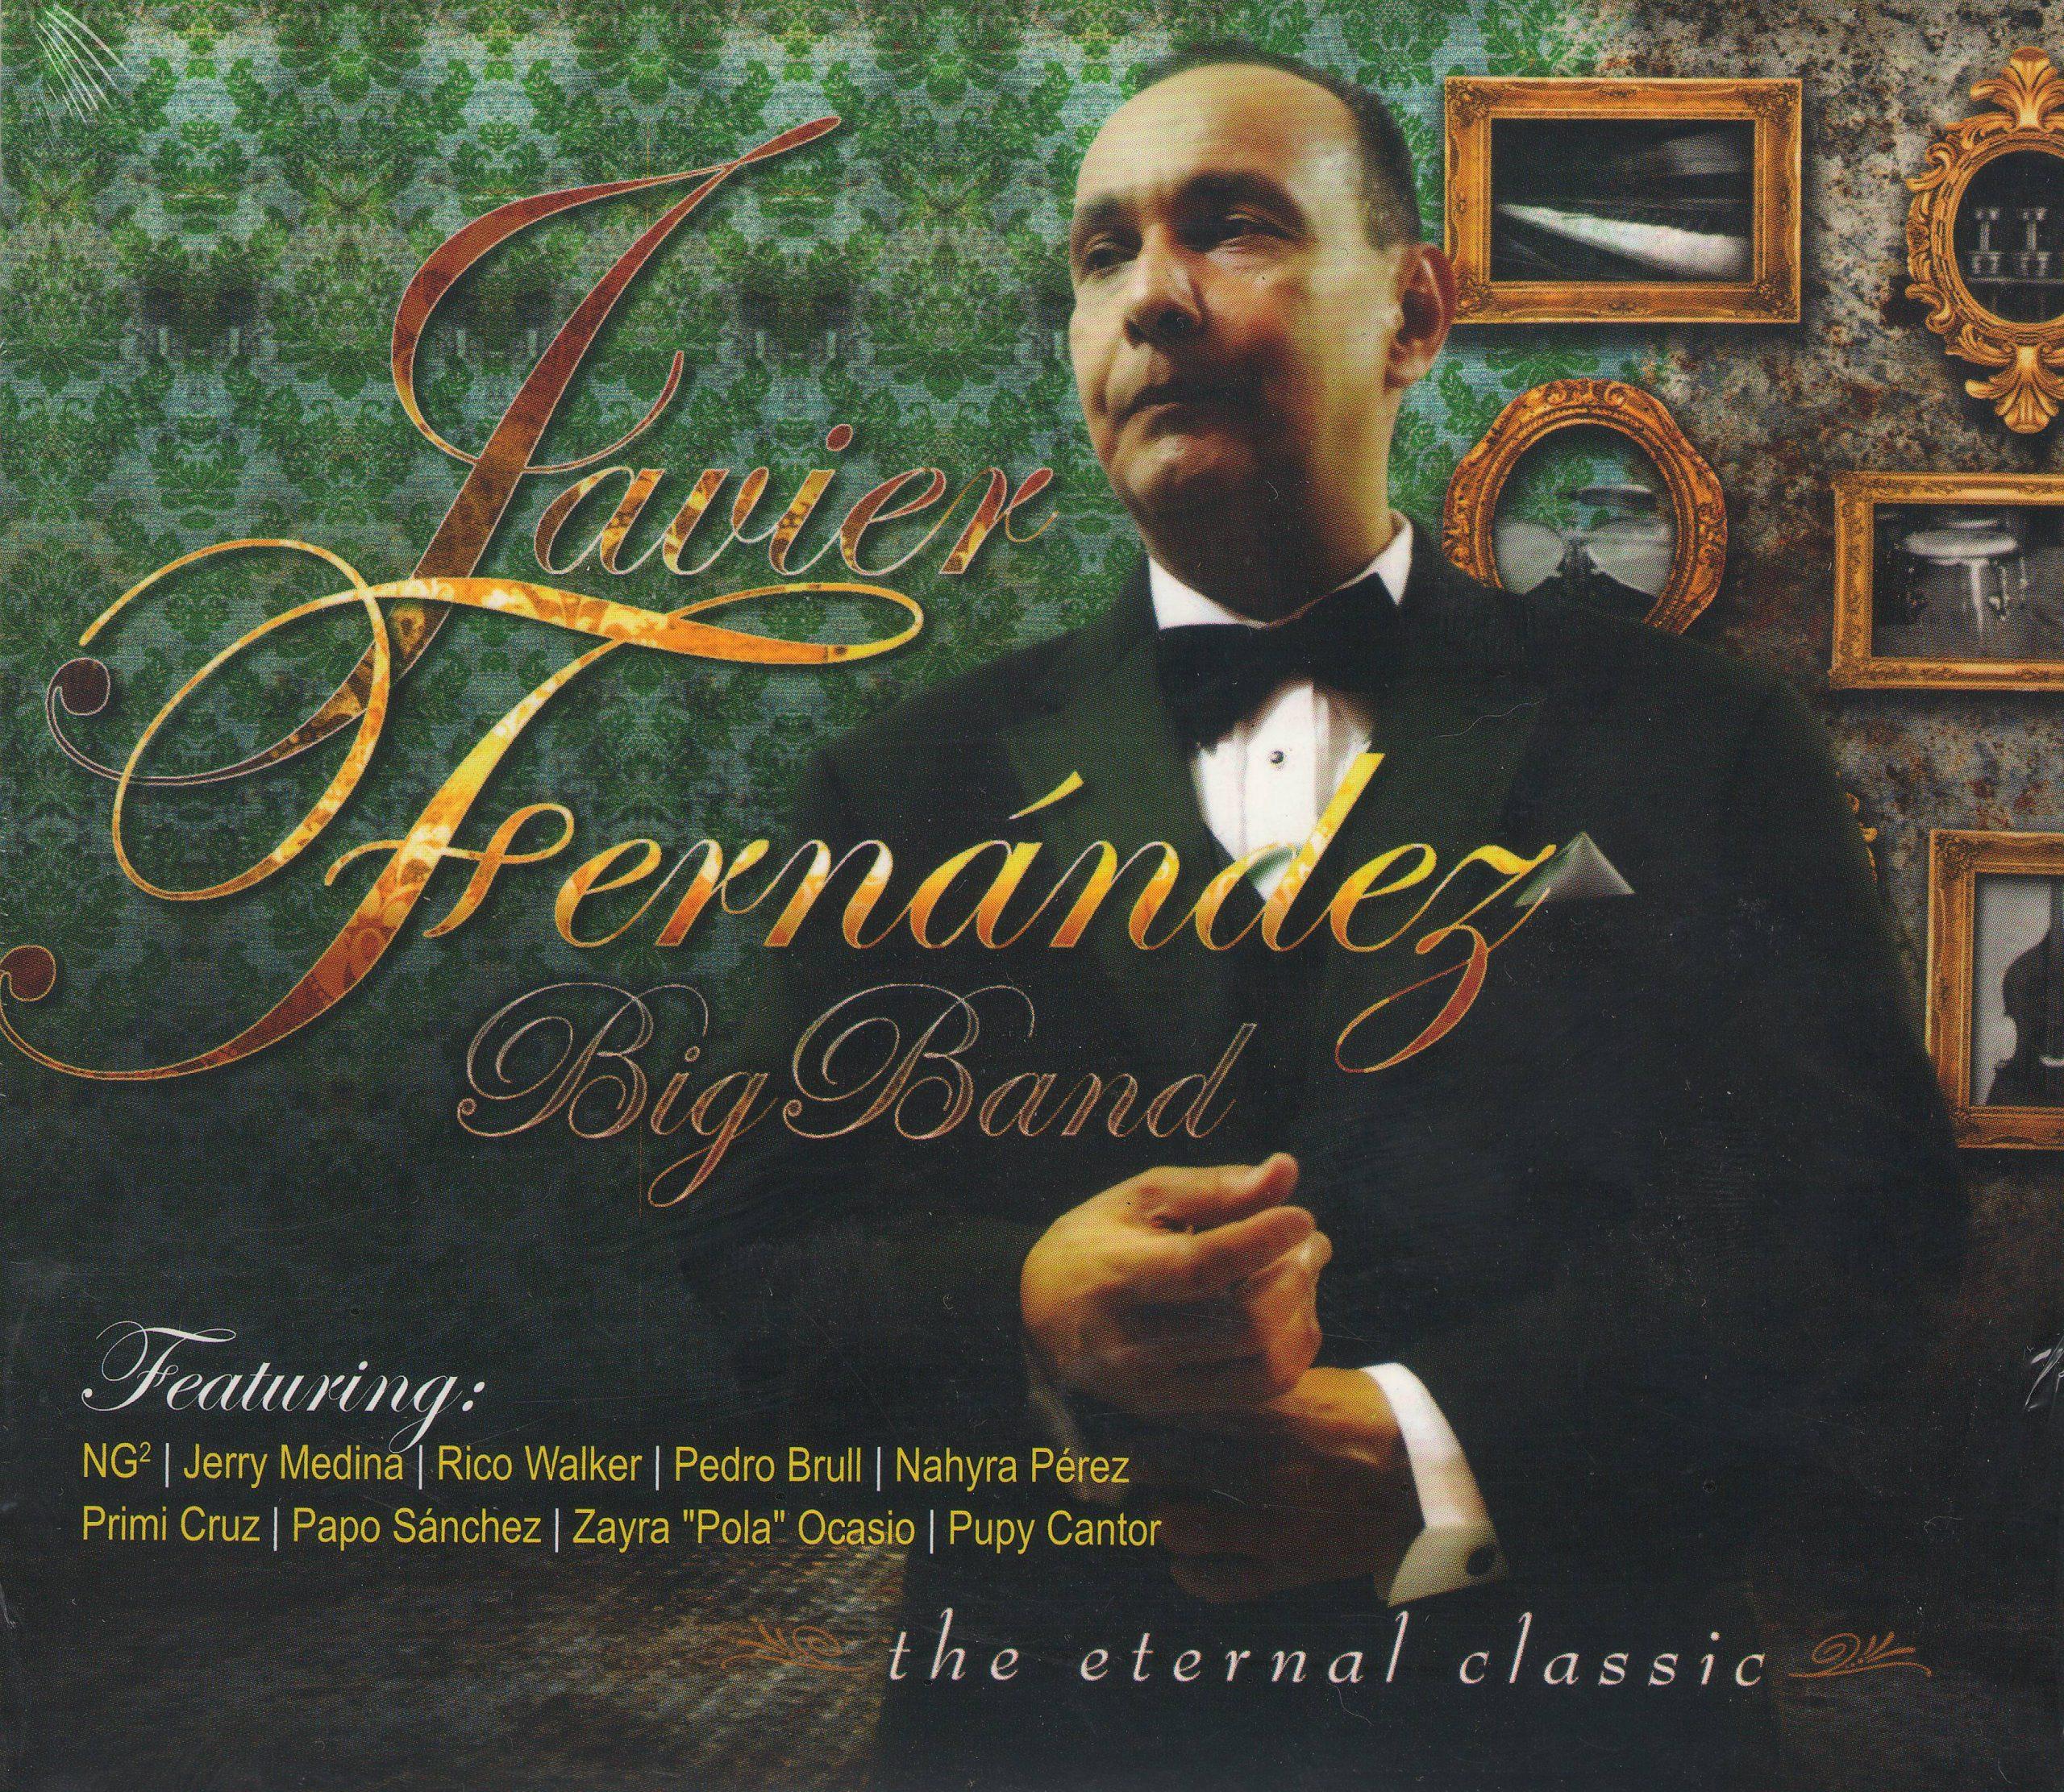 11. Javier Fernandez Big Band   the eternnal classic